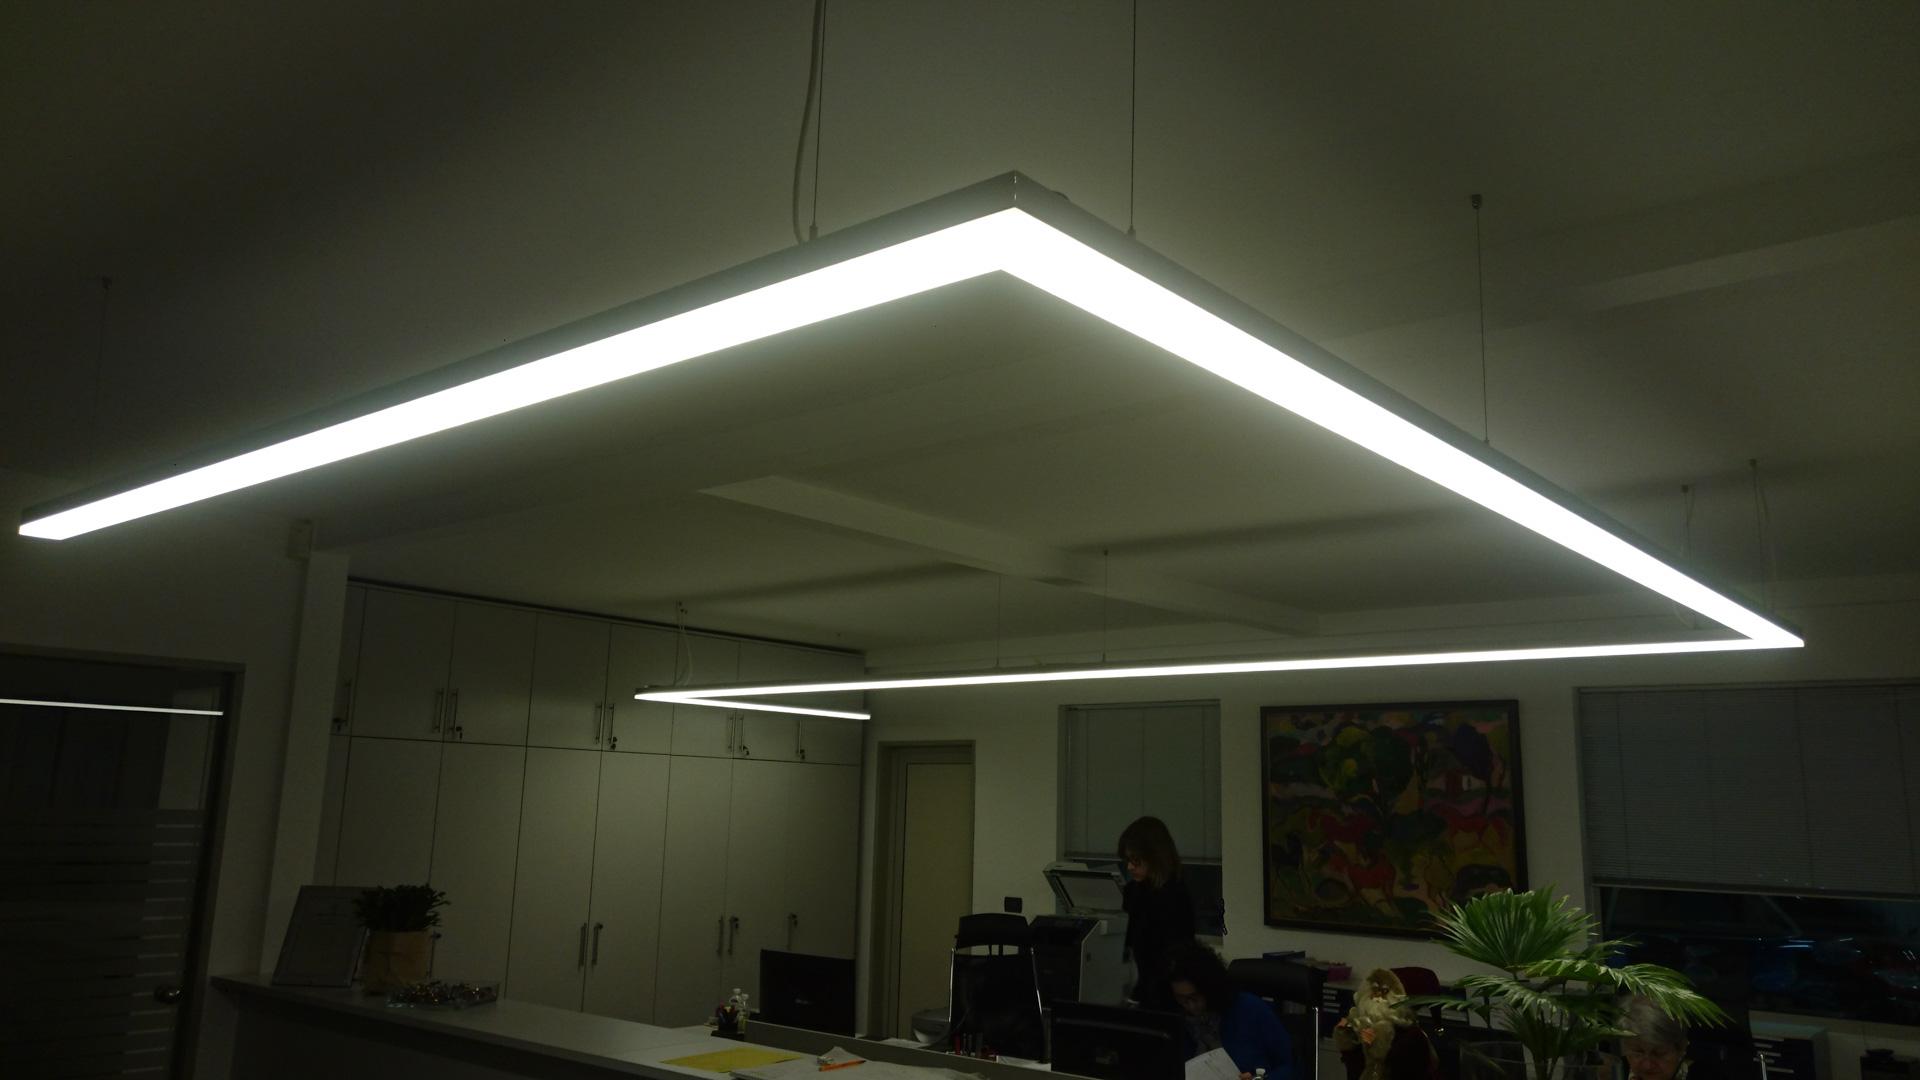 Ufficio - Office